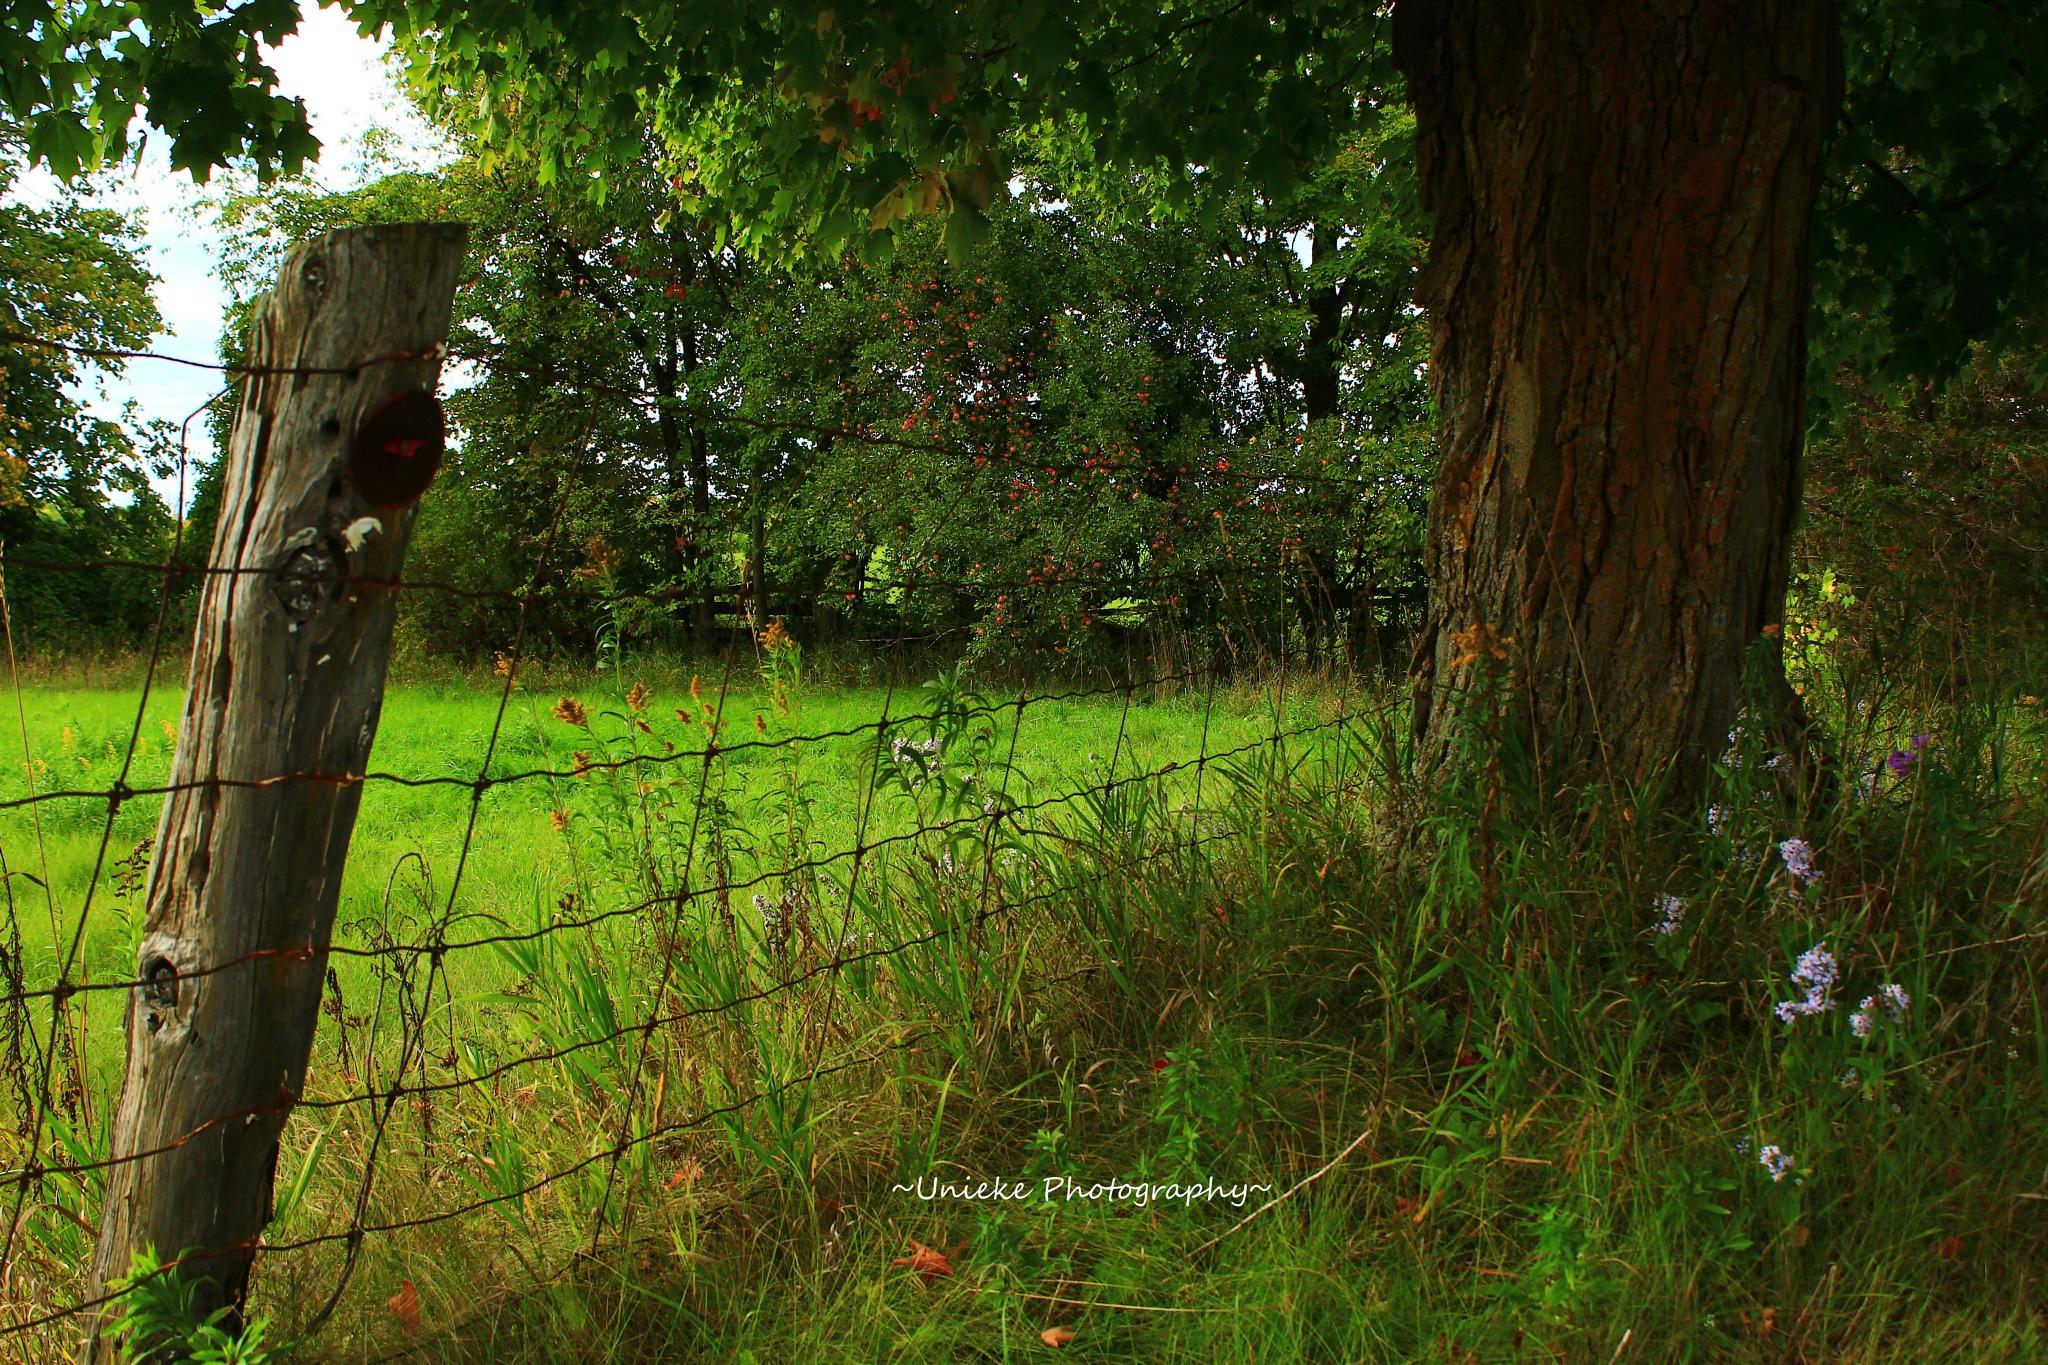 Farm Fence by ~Unieke Photography~